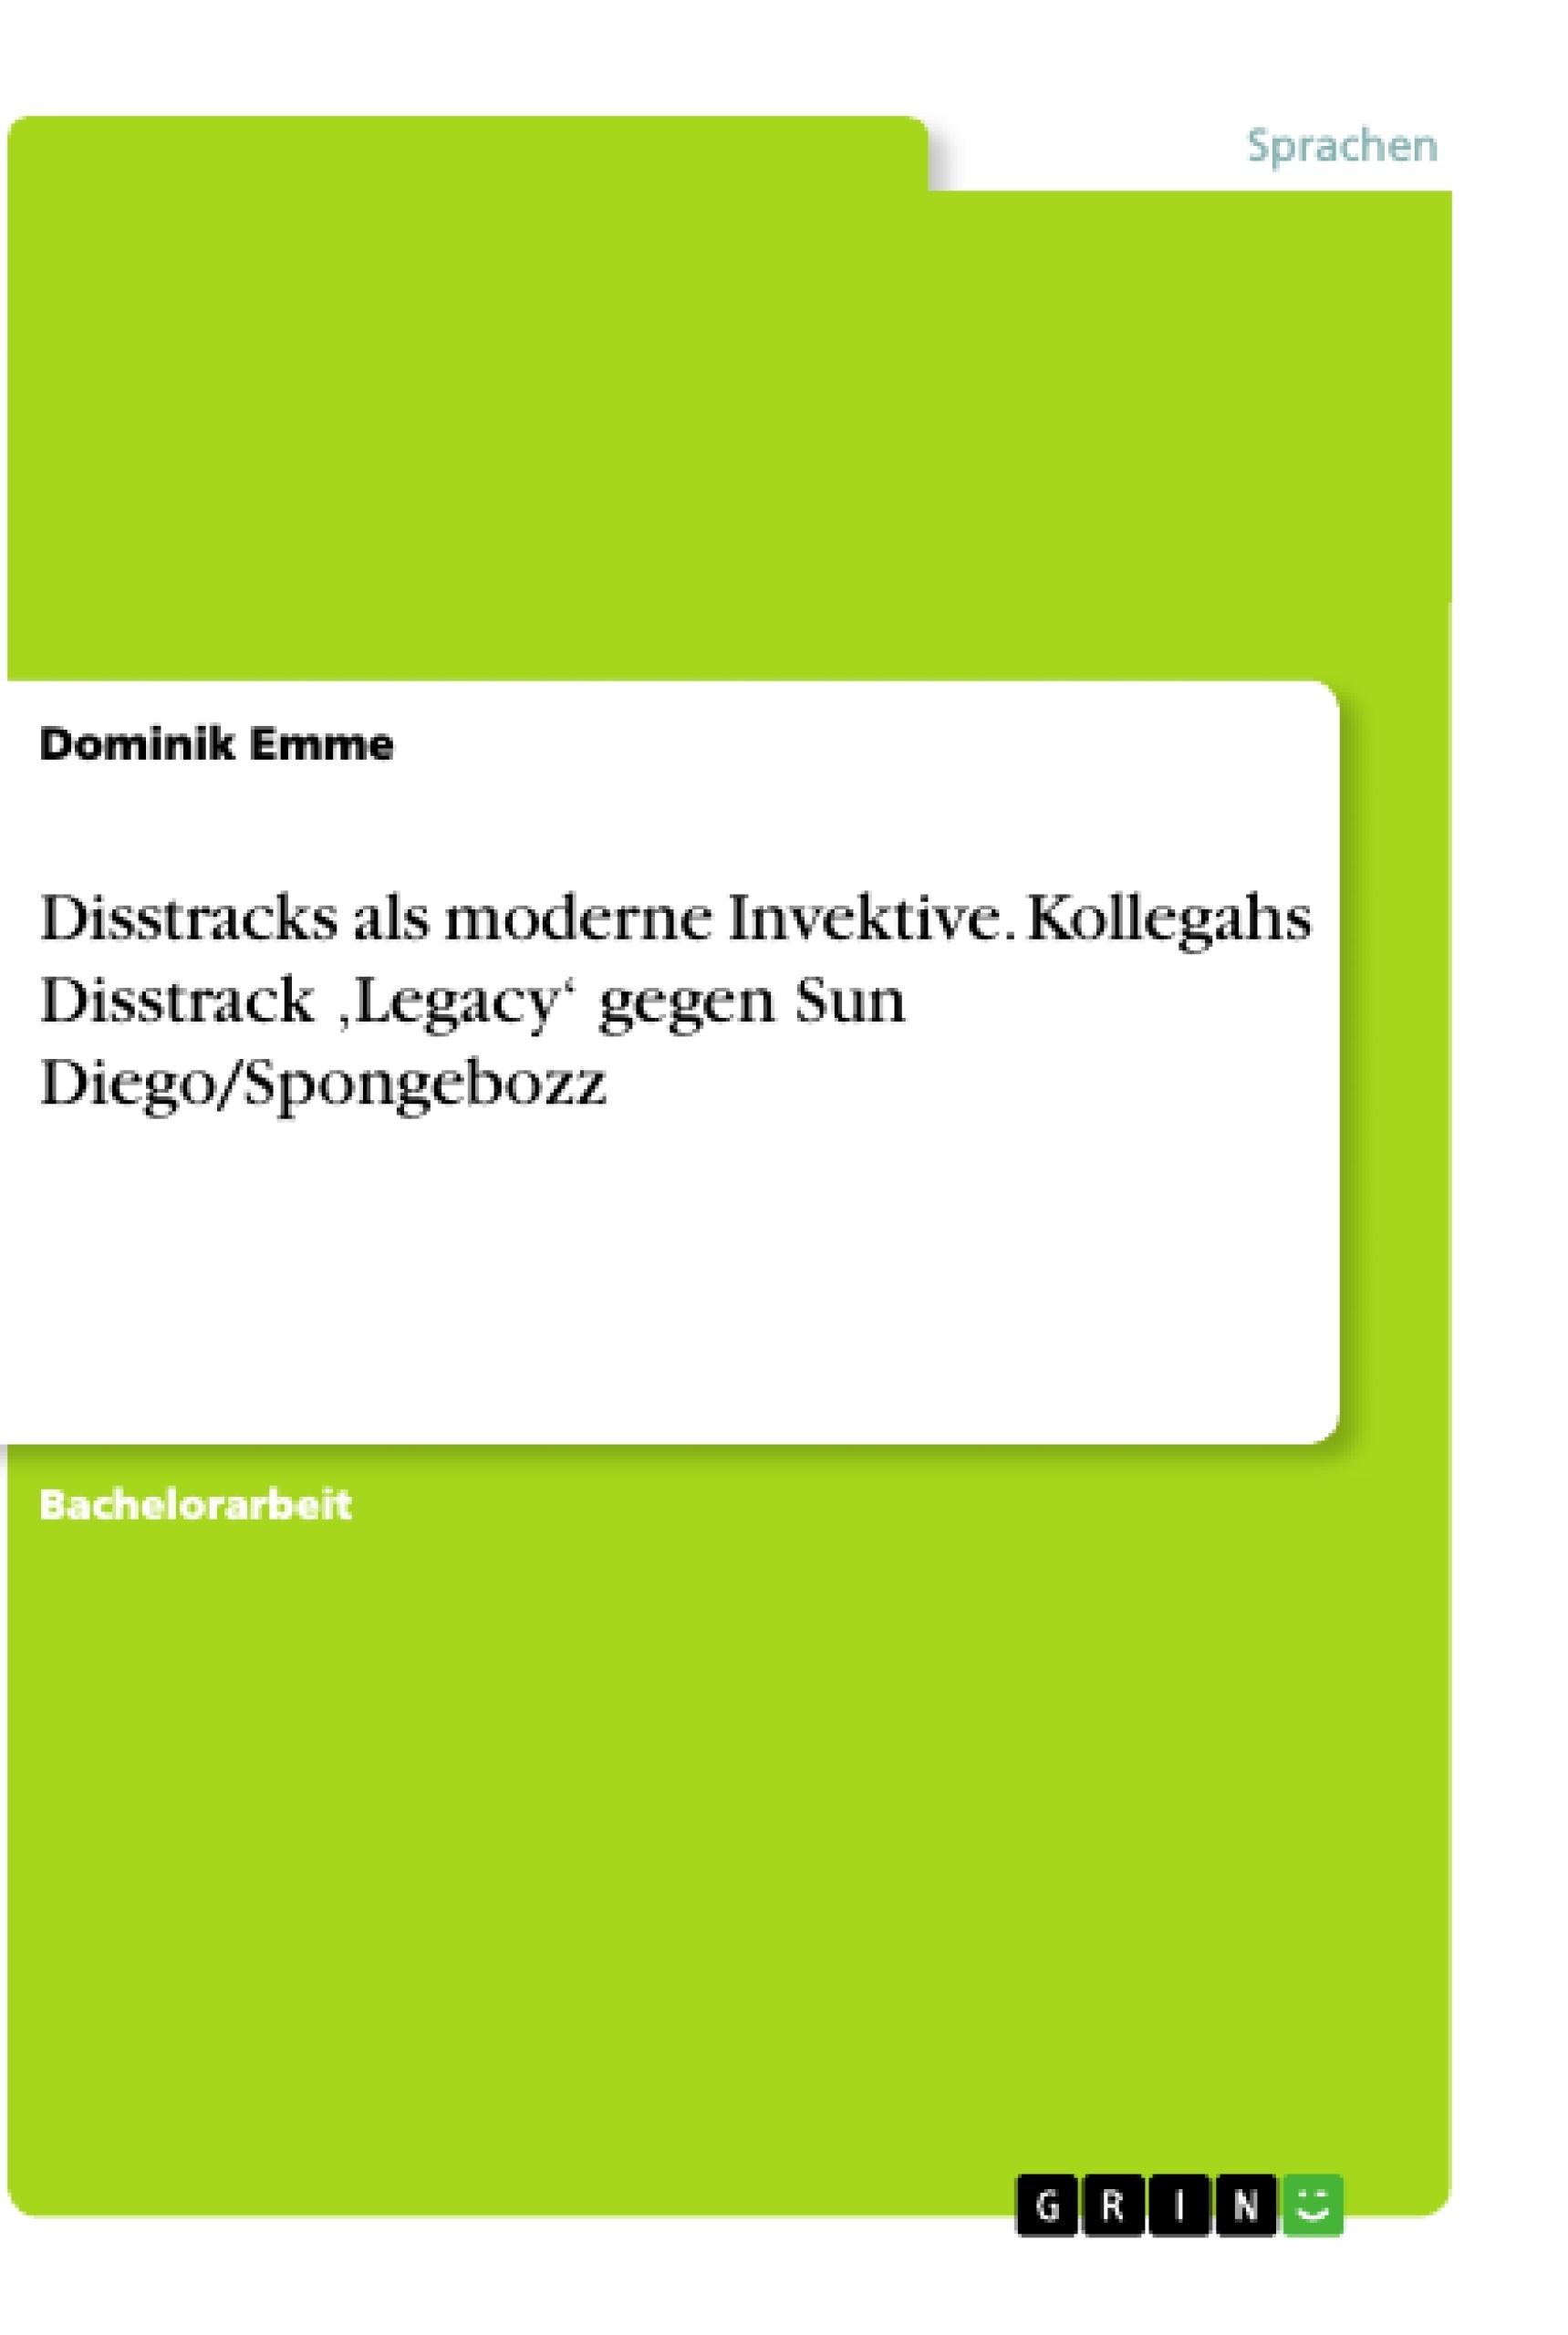 Titel: Disstracks als moderne Invektive. Kollegahs Disstrack 'Legacy' gegen Sun Diego/Spongebozz